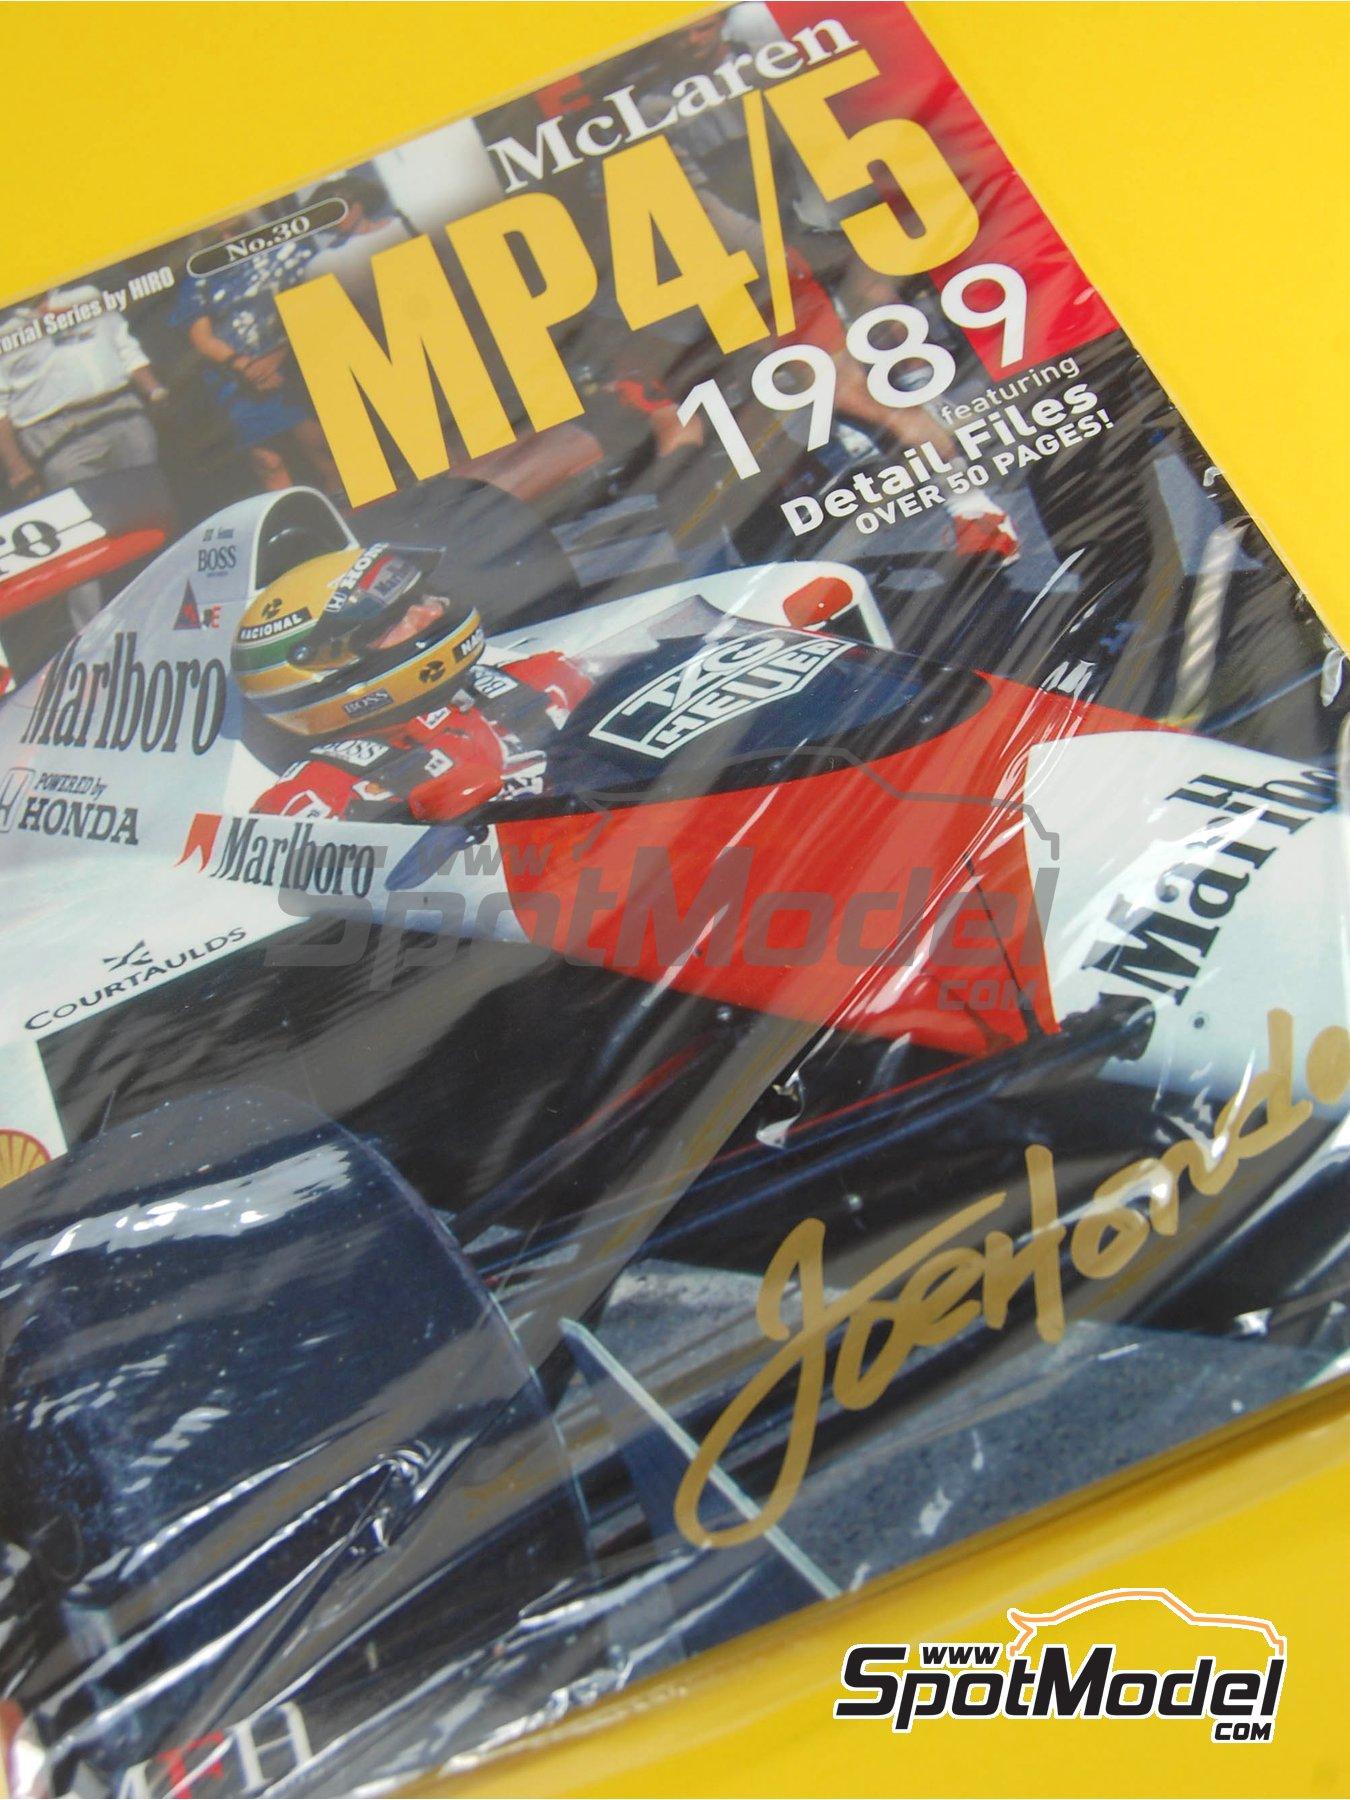 JOE HONDA Racing Pictorial Series - McLaren MP4/5 - FIA Formula 1 World Championship 1989 | Reference / walkaround book manufactured by Model Factory Hiro (ref.MFH-JH30) image